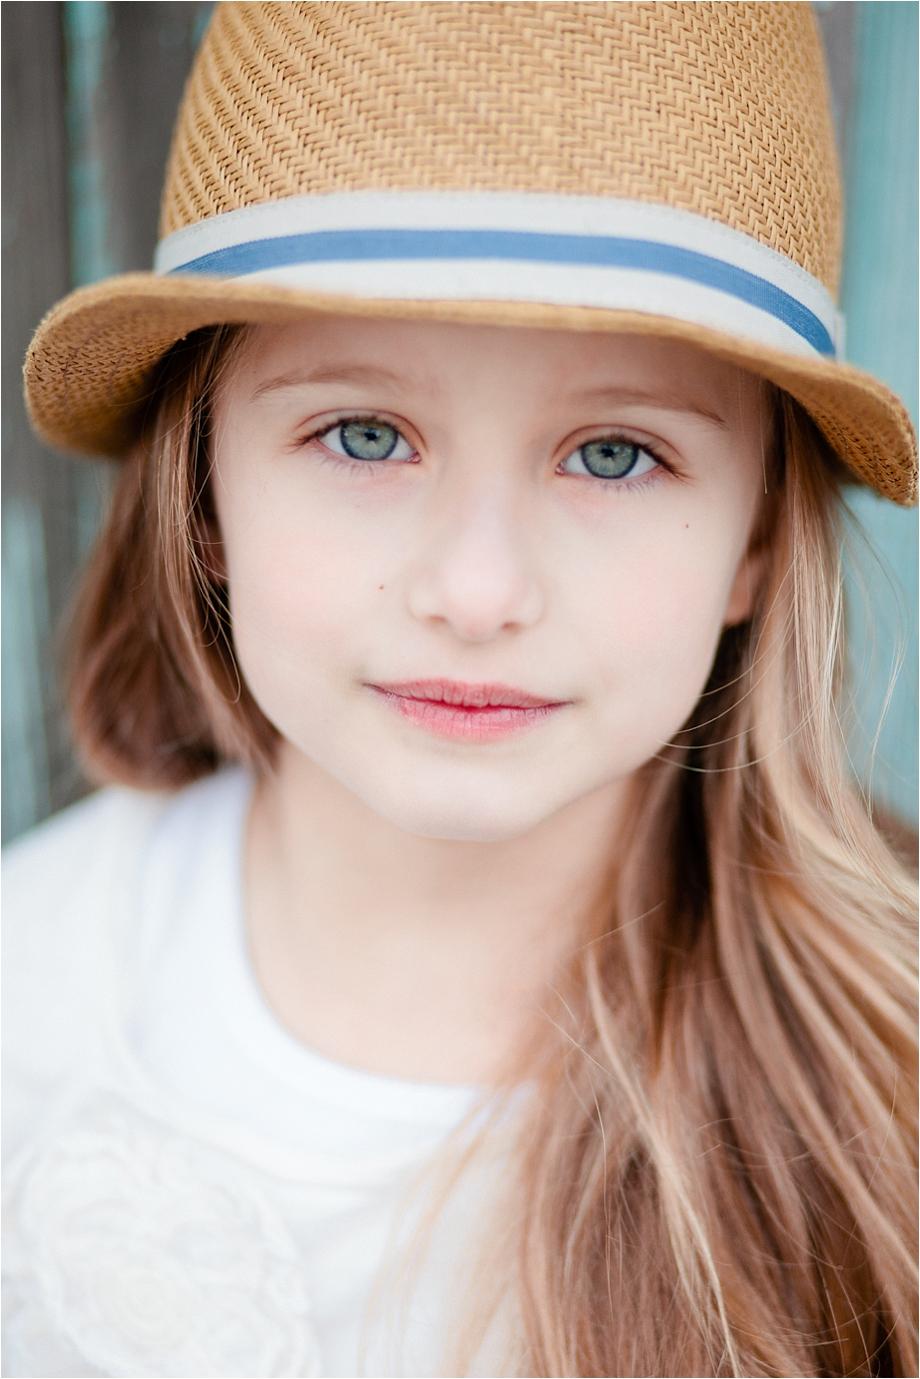 childrens-photography-surrey-eddie-judd-family-photographer_0009